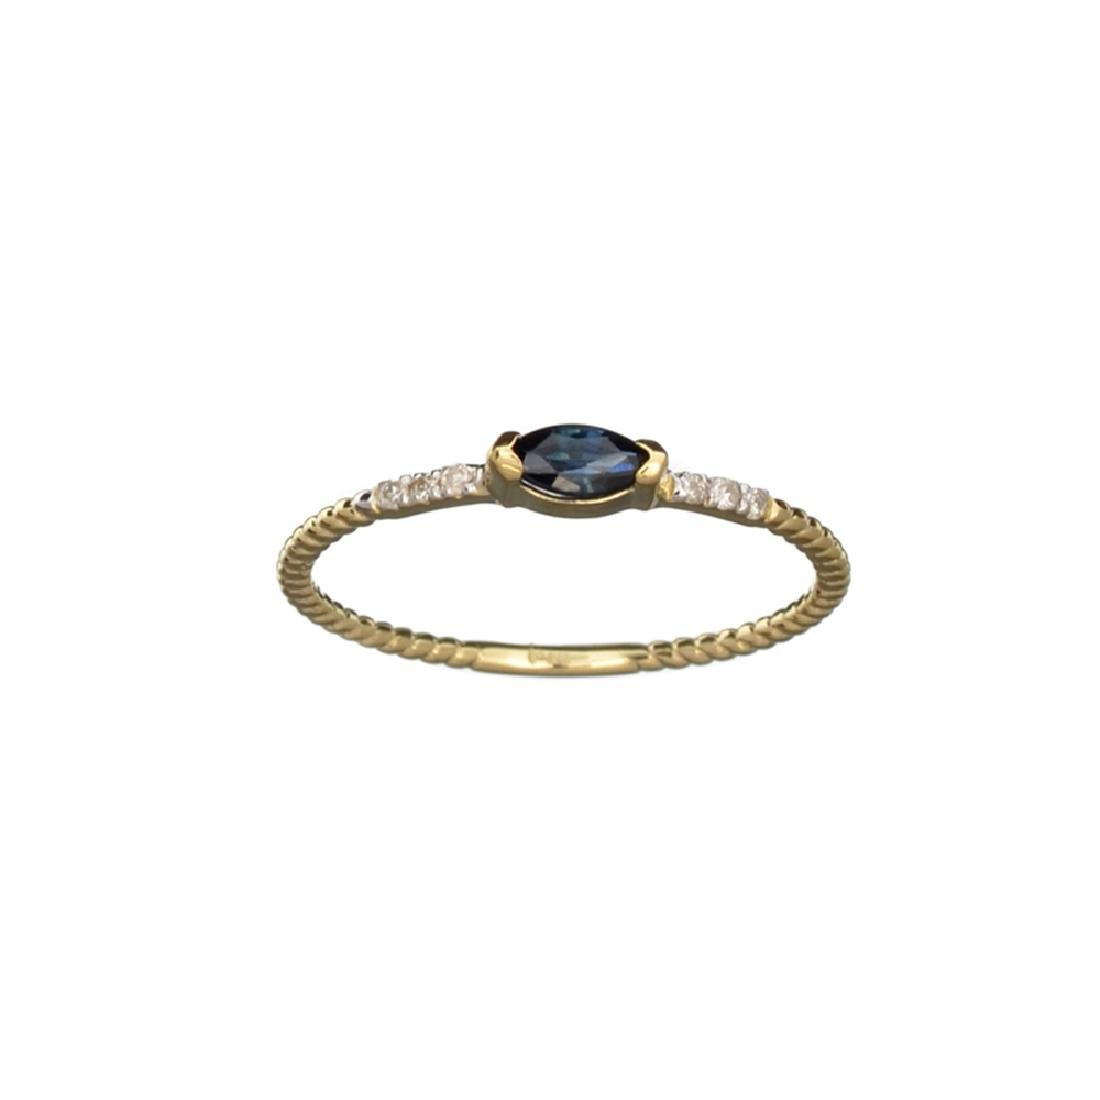 APP: 0.5k Fine Jewelry 14 KT Gold, 0.20CT Blue Sapphire